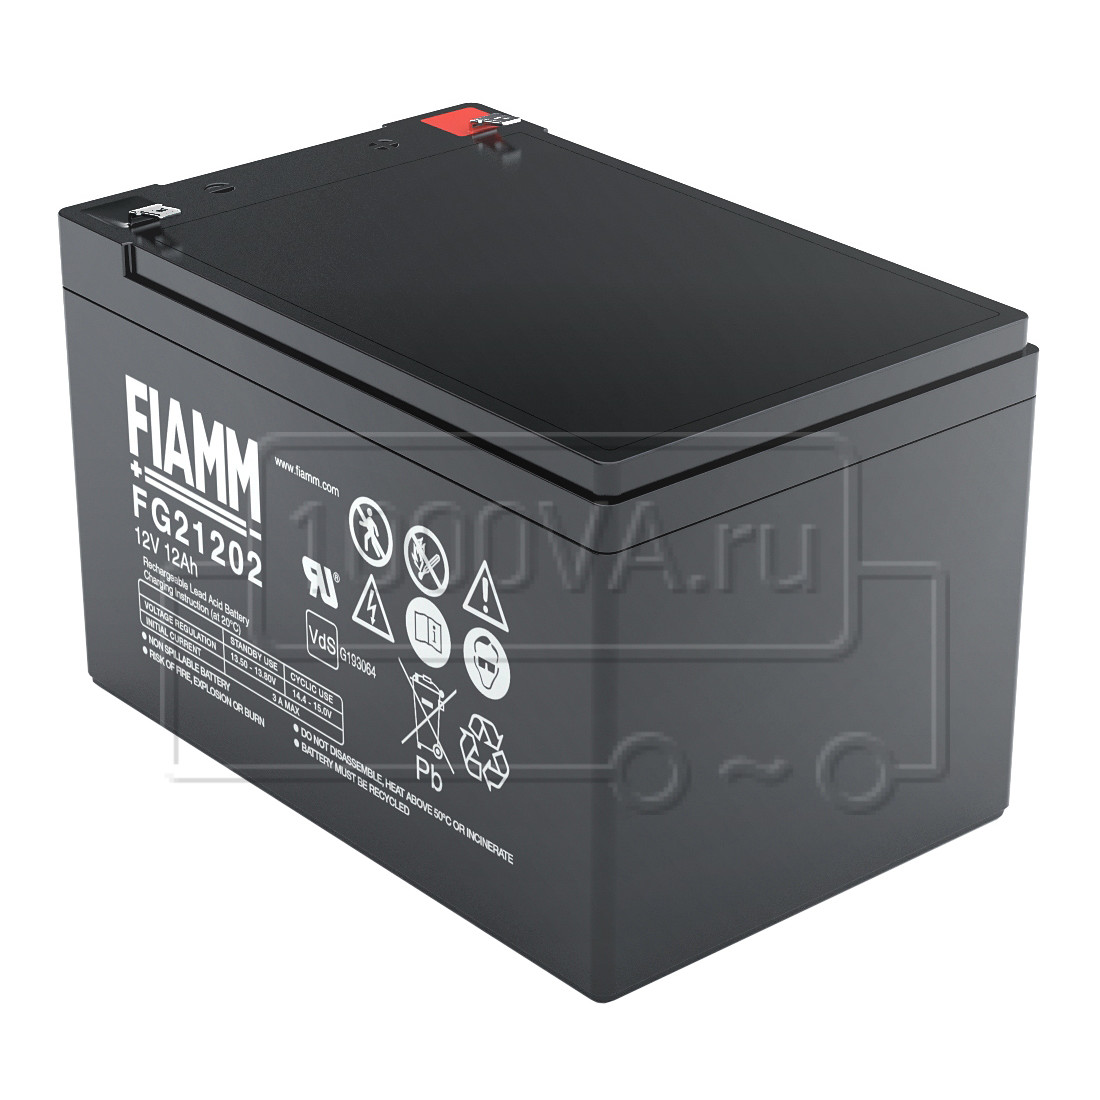 FIAMM FG 21202